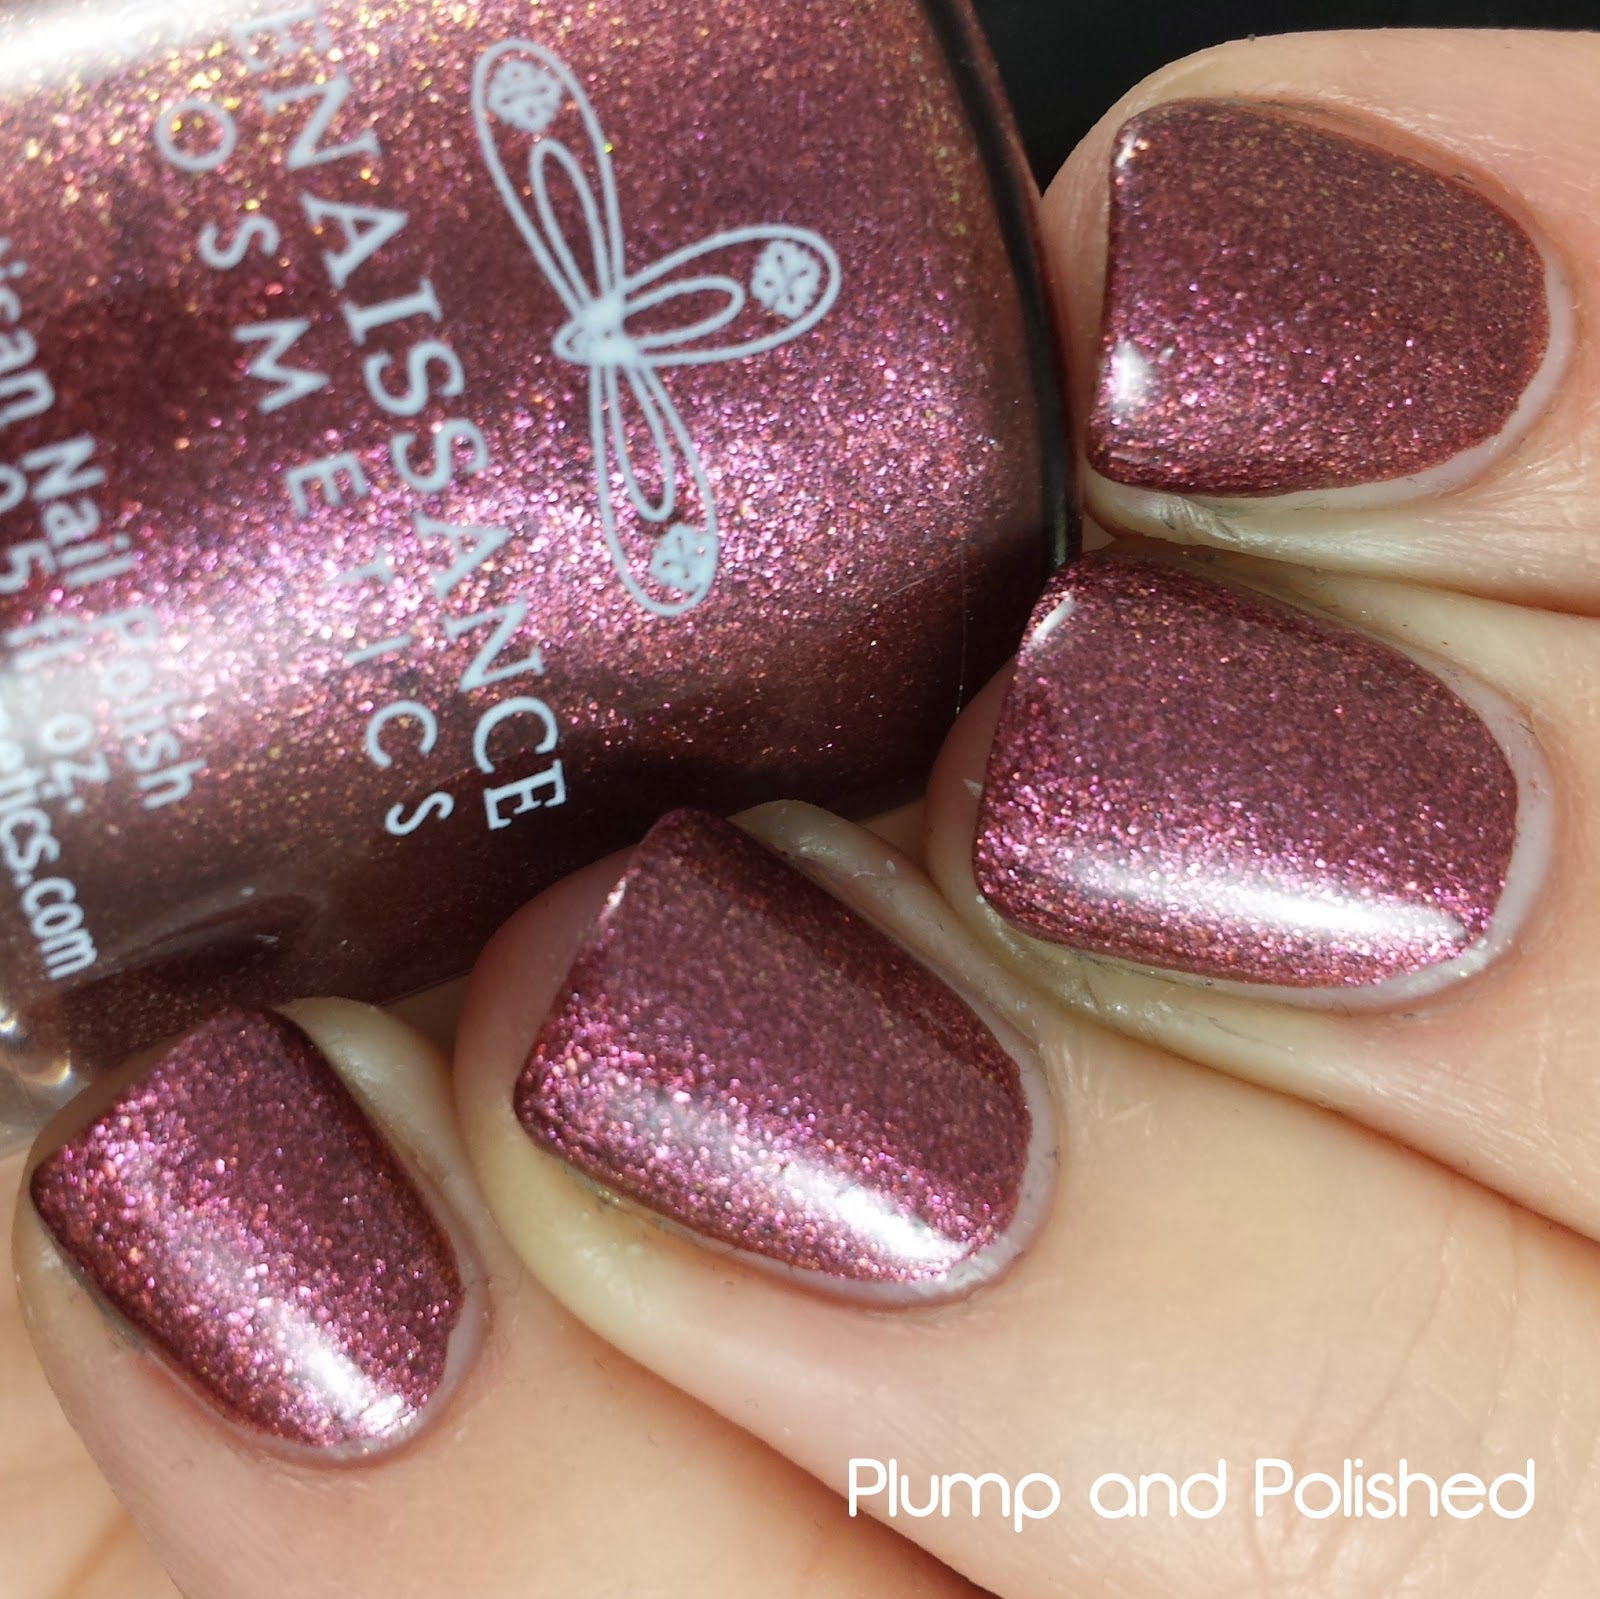 Renaissance Cosmetics - Runnymede